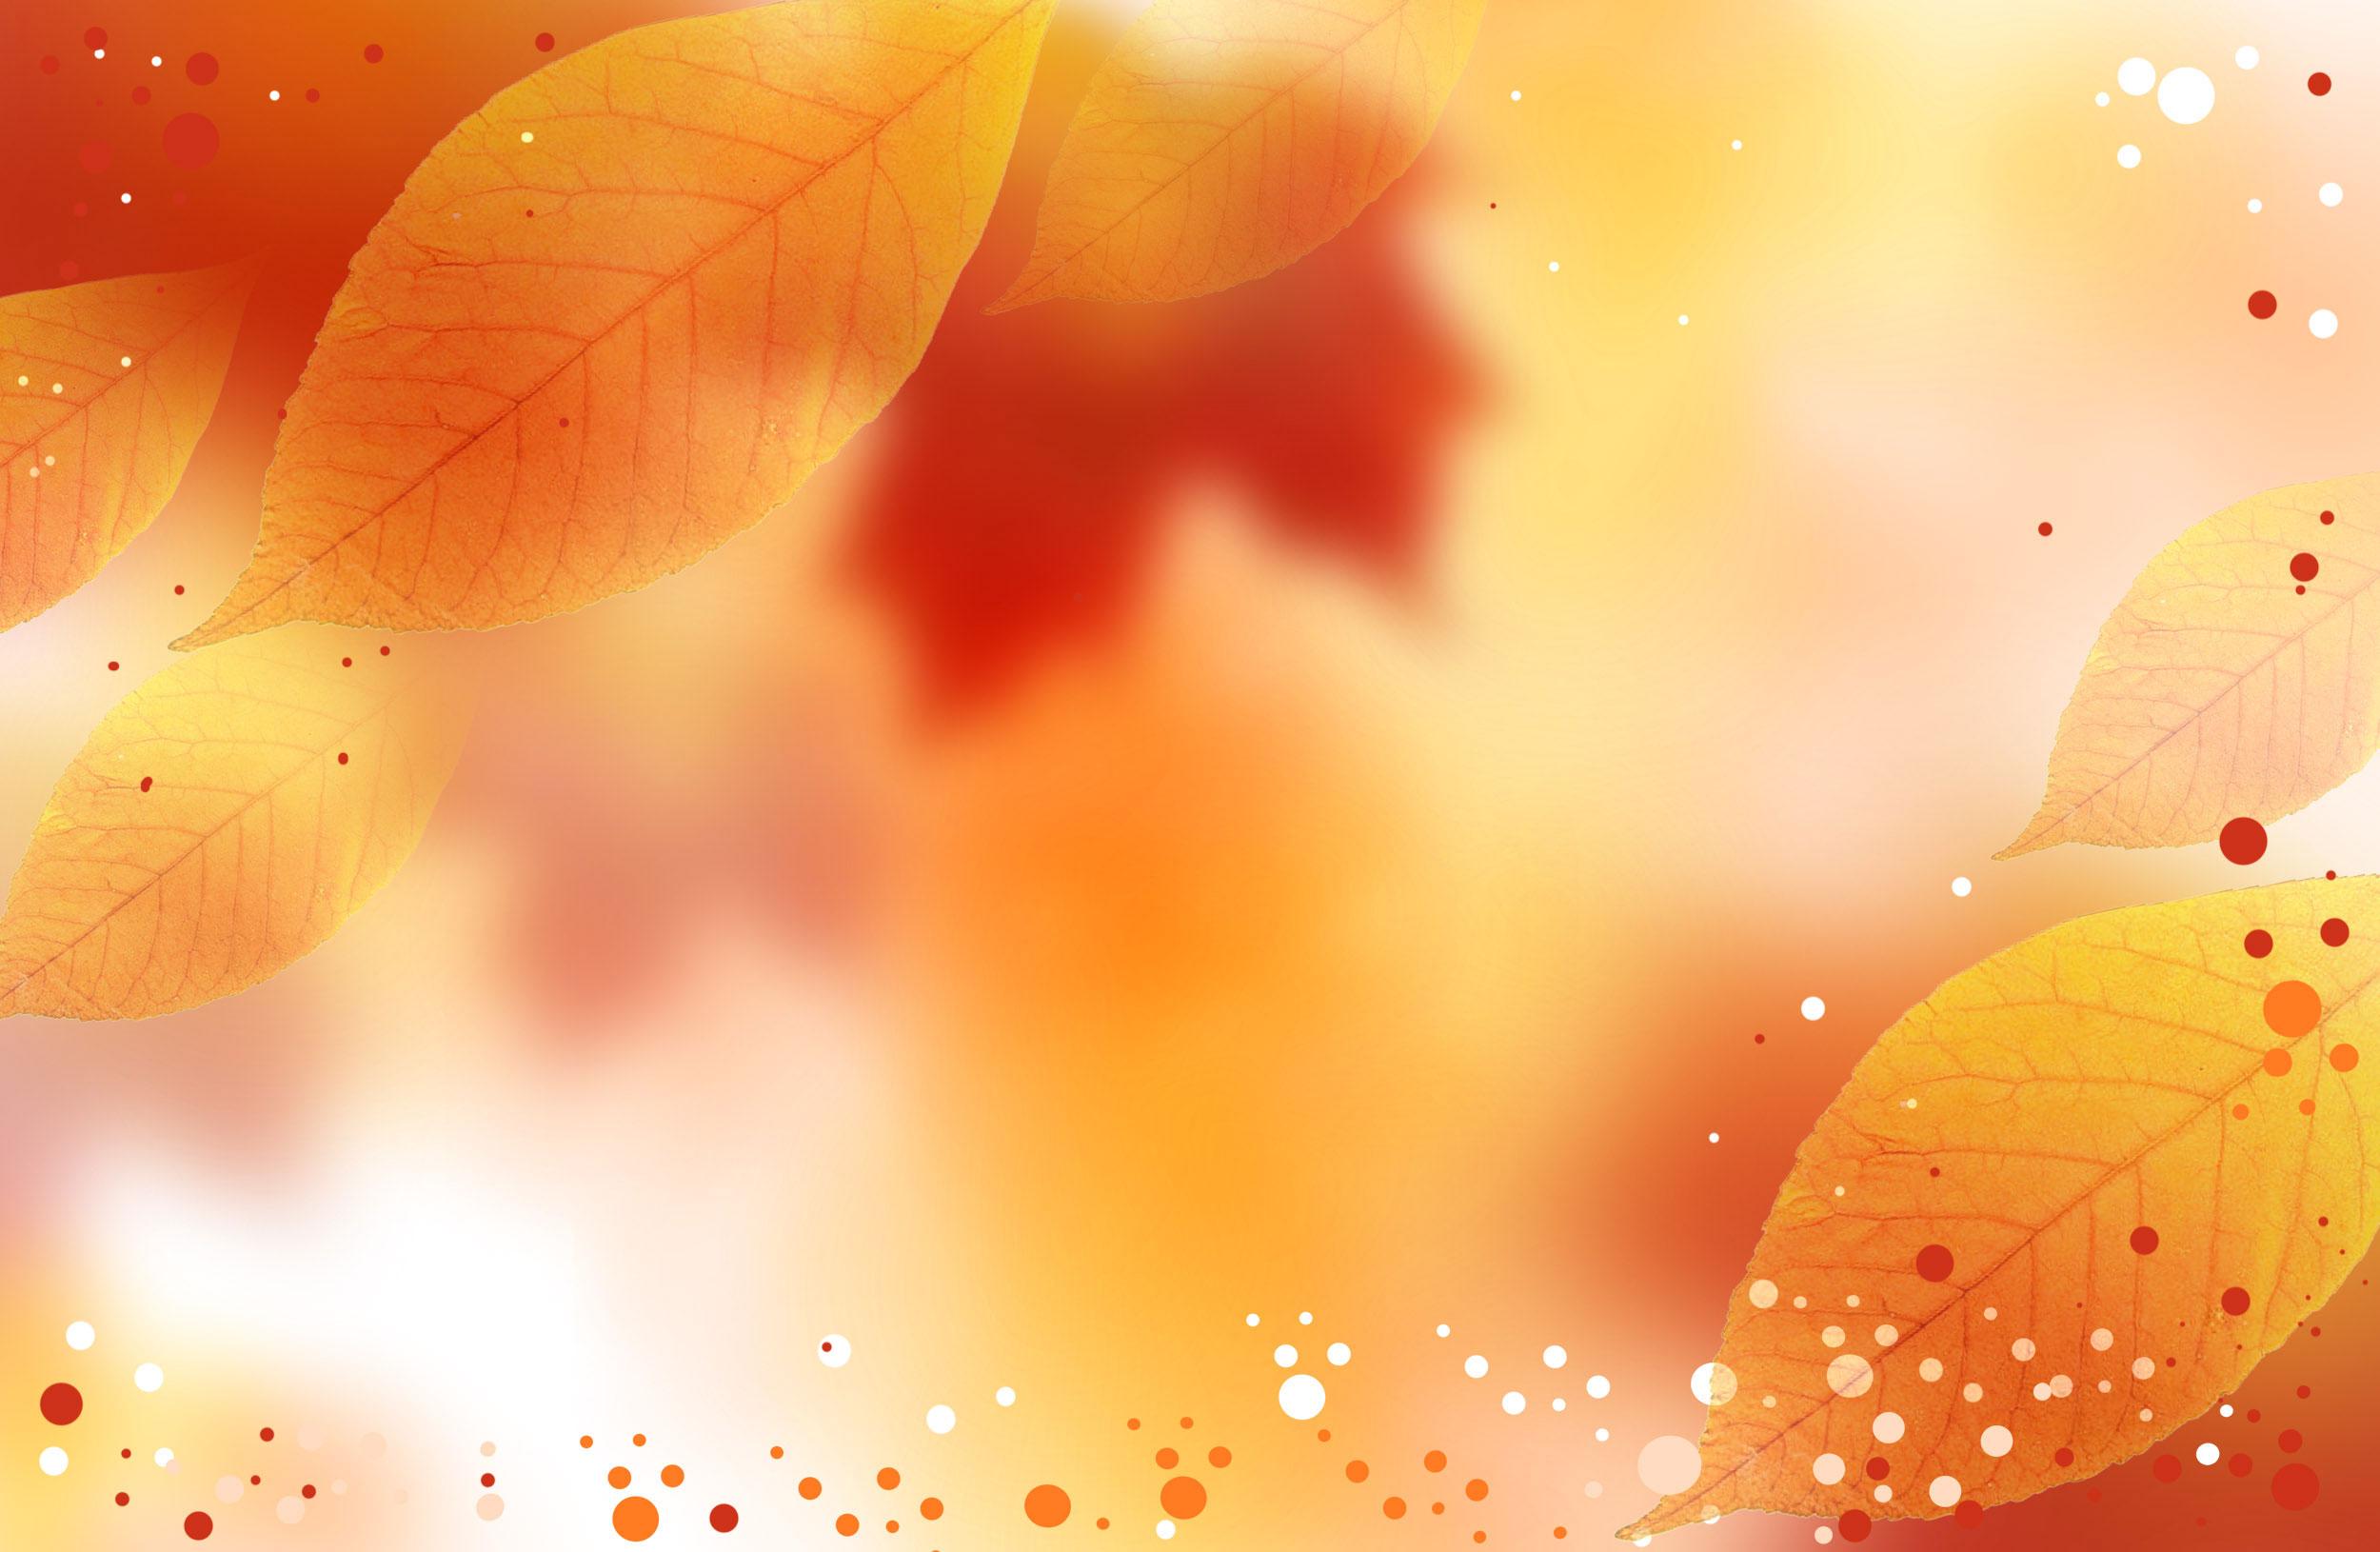 Free Autumn Wallpaper Backgrounds - WallpaperSafari